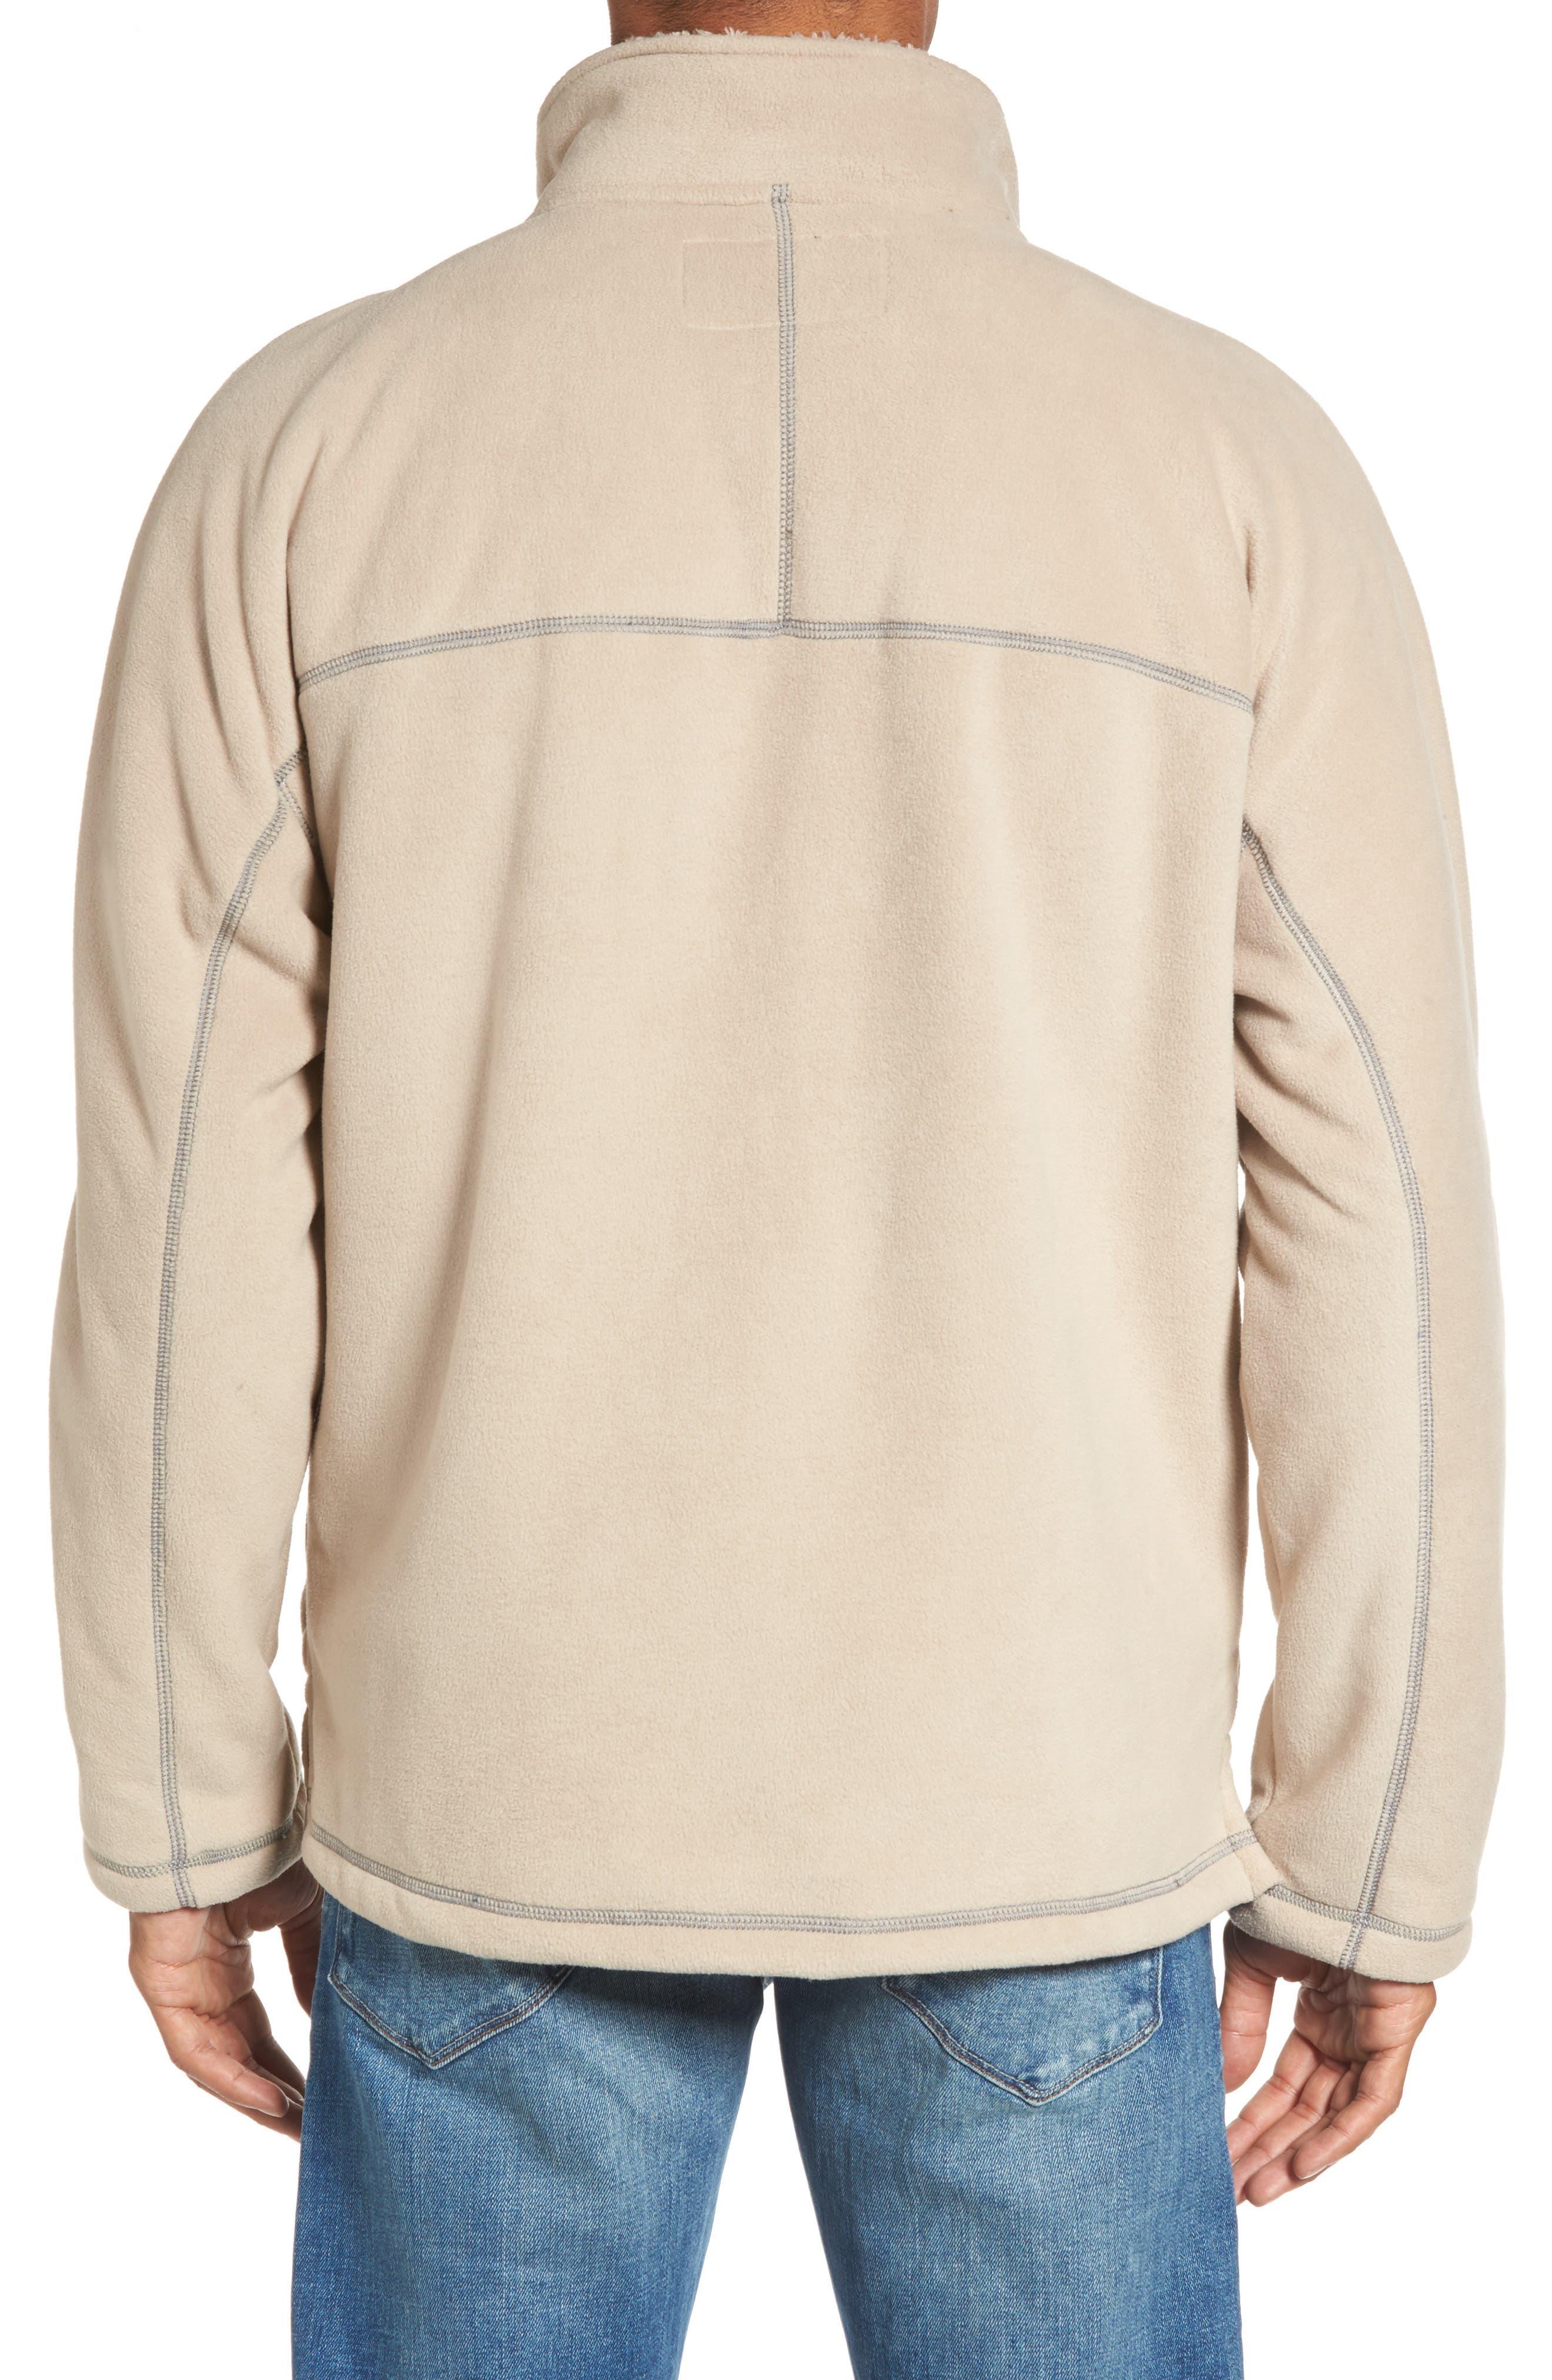 Bonded Polar Fleece Lined Pullover,                             Alternate thumbnail 2, color,                             249